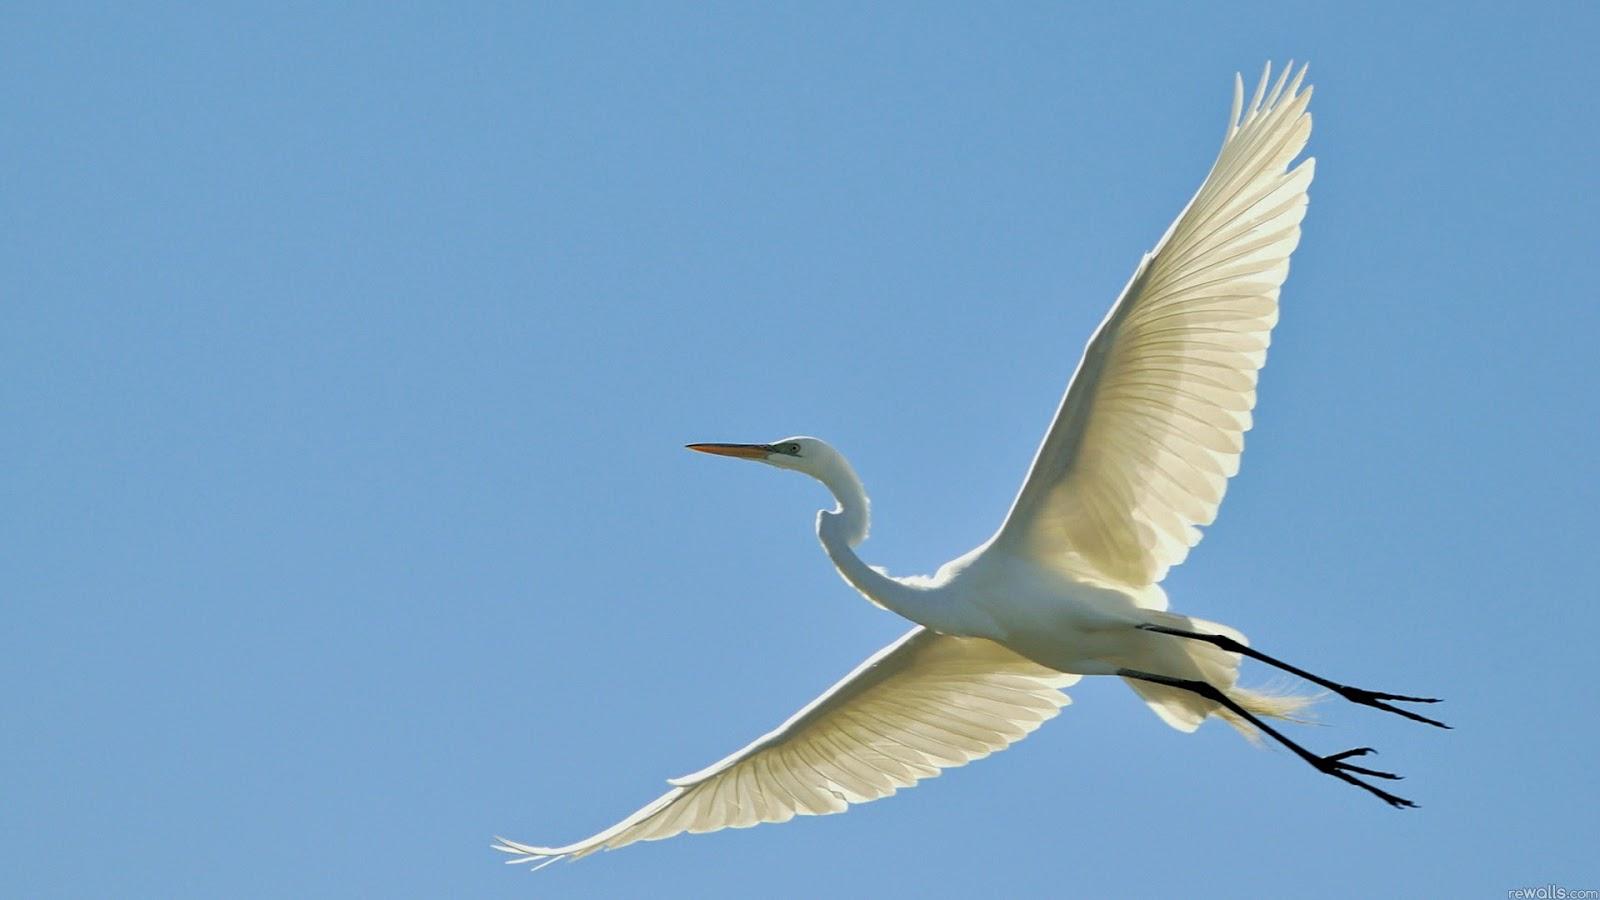 Beautiful And Dangerous Animals Birds Hd Wallpapers: 10 Most Beautiful Flying Birds New HD Wallpapers 2014